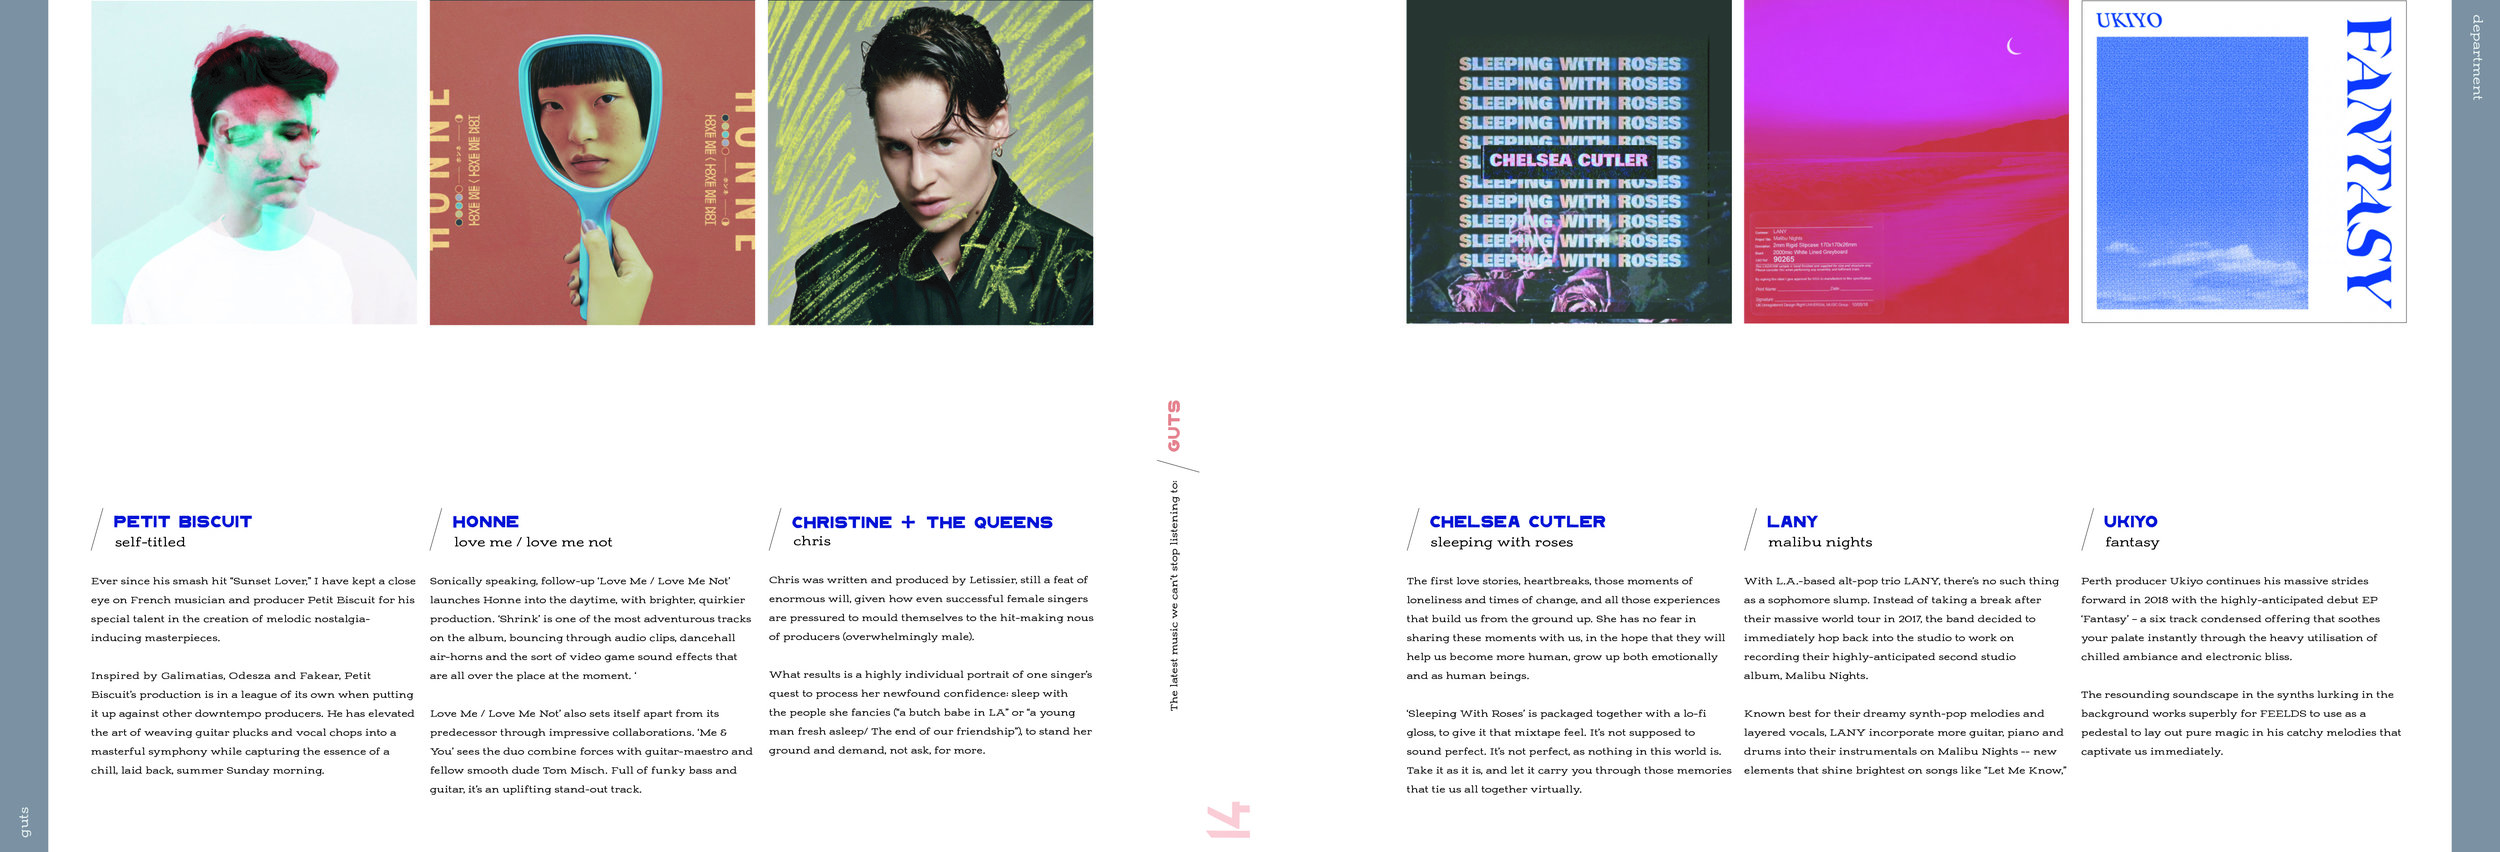 Guts: Album Reviews